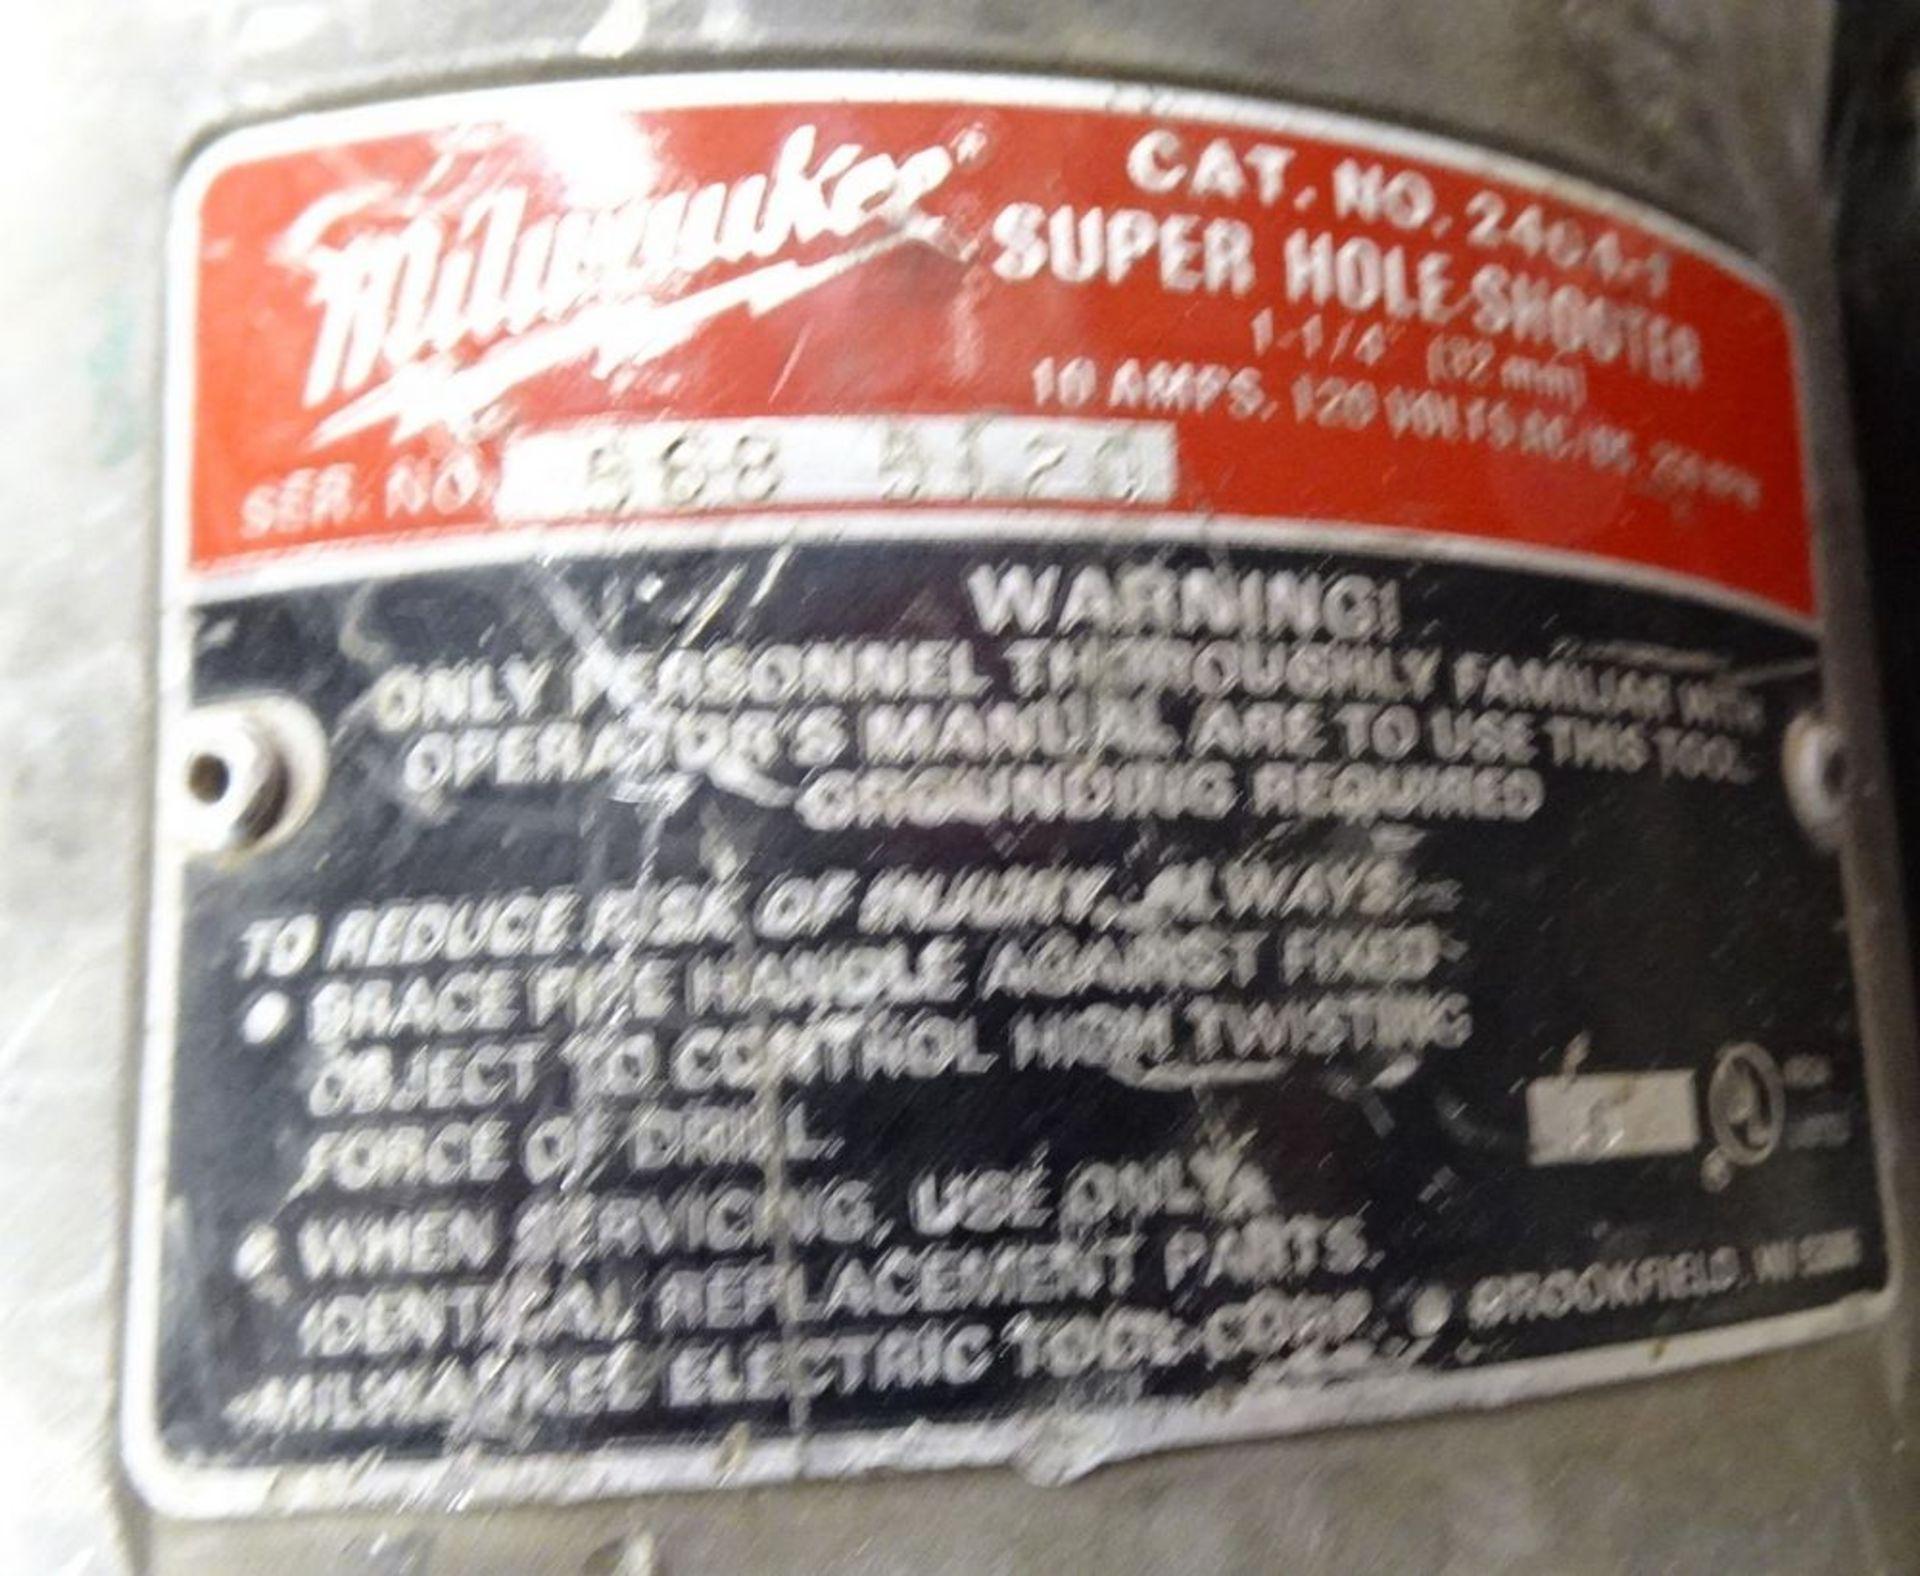 "Lot 10 - MILWAUKEE 2401-1 SUPER HOLE SHOOTER DRILL & MILWAUKEE 8-1/4"" 6405 CIRCULAR SAW, 120V"